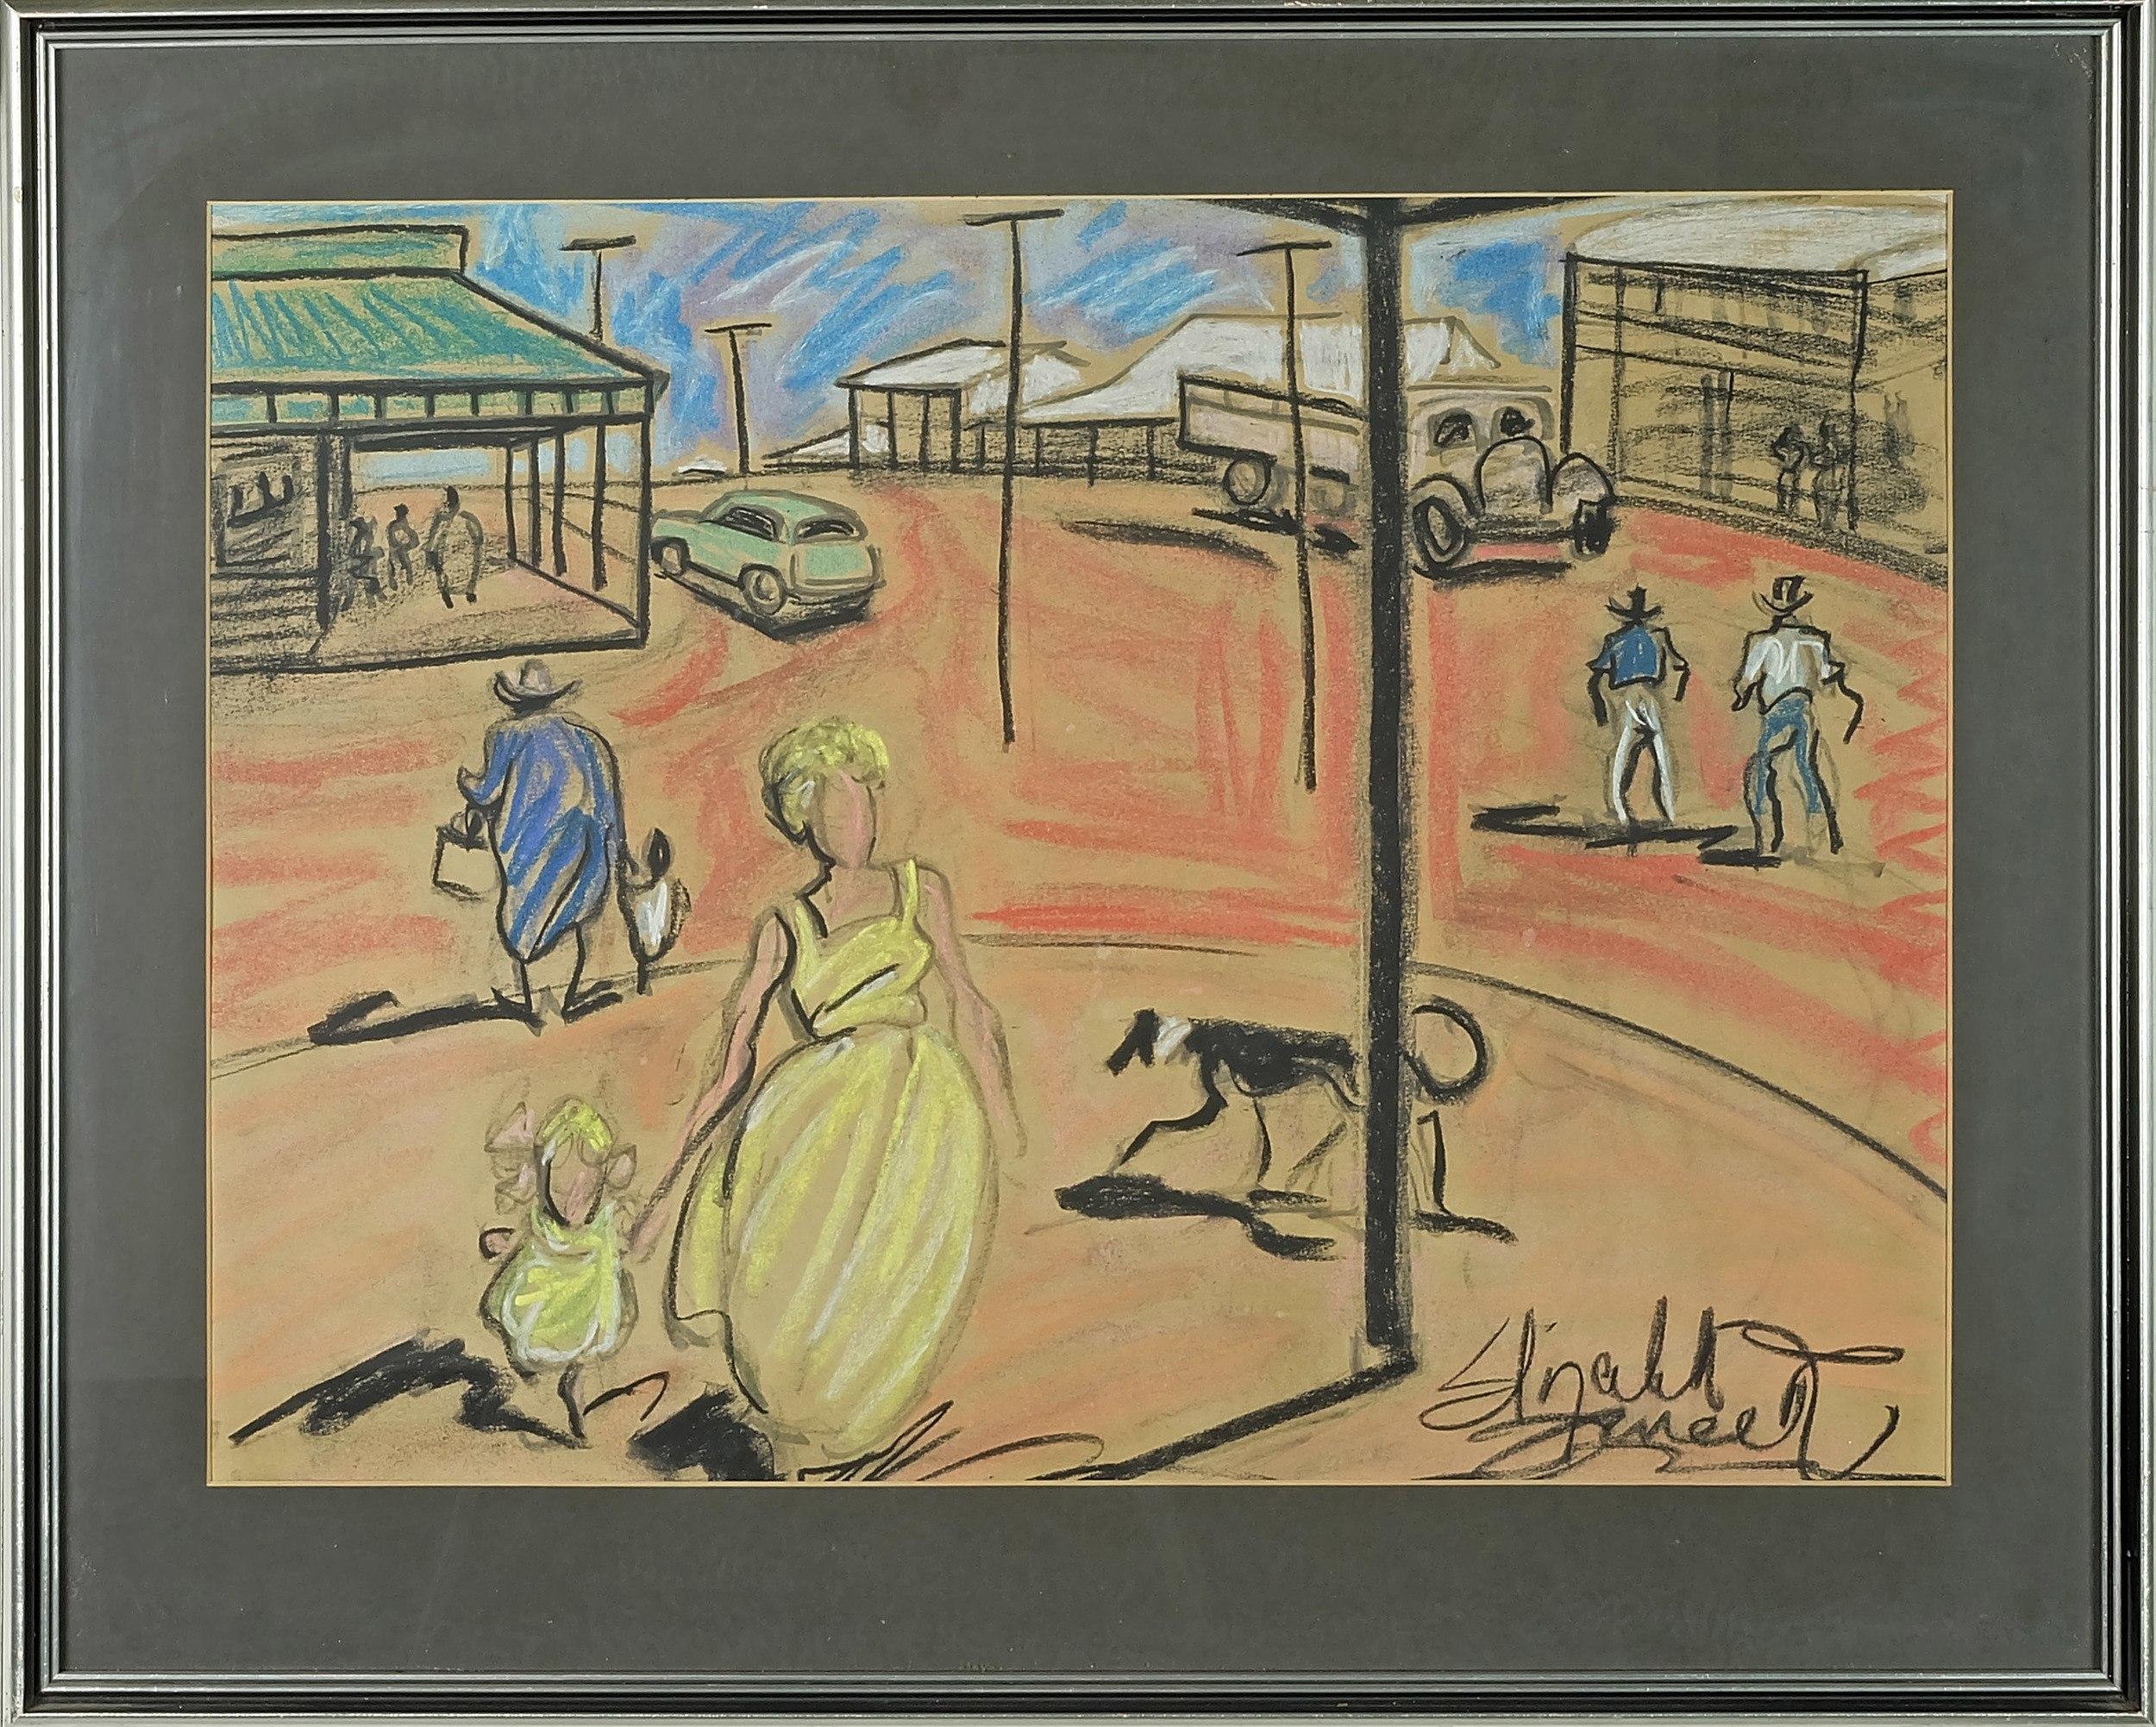 'Elizabeth Durack (1915-2000) Untitled From the Meekathara Series Pastel on Paper'